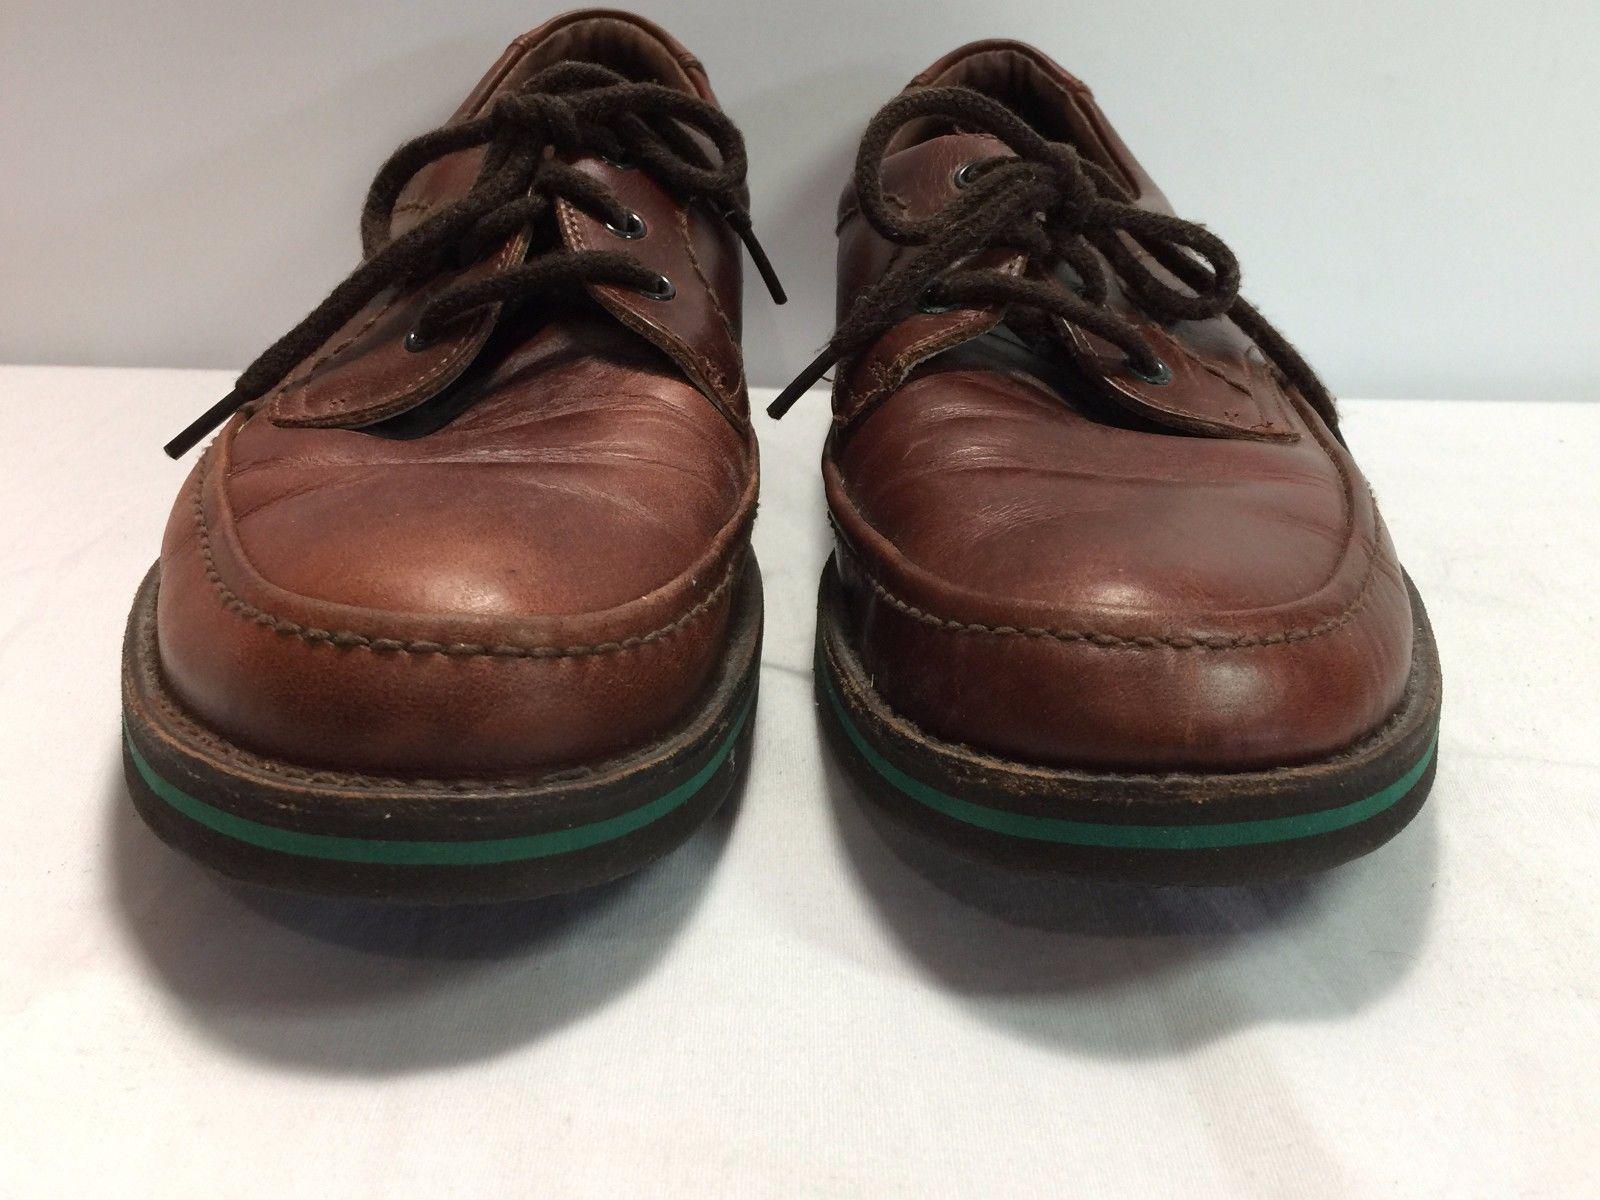 ed77310d2d0b7e ... HUSH PUPPIES The Body Shoe Men s Brown Leather Lace Oxford Walking Shoe  ...